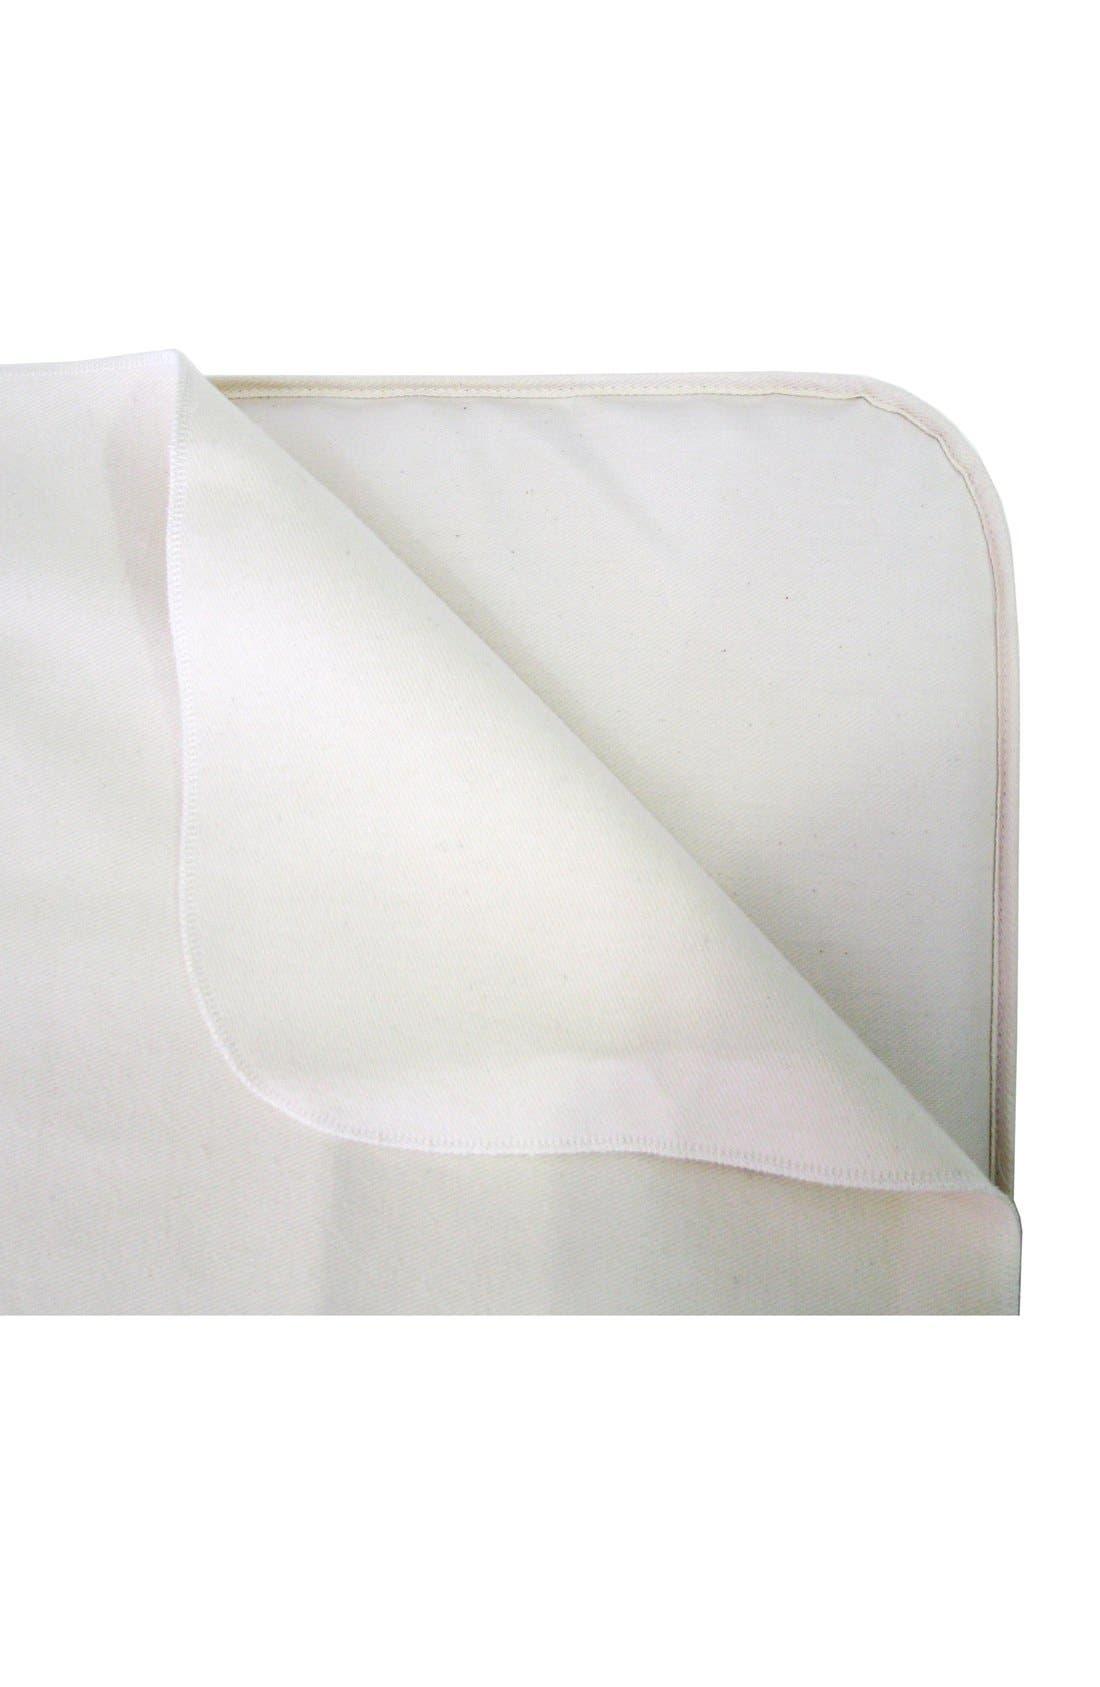 Naturepedic Organic Cotton Waterproof Flat Crib Protector Pad